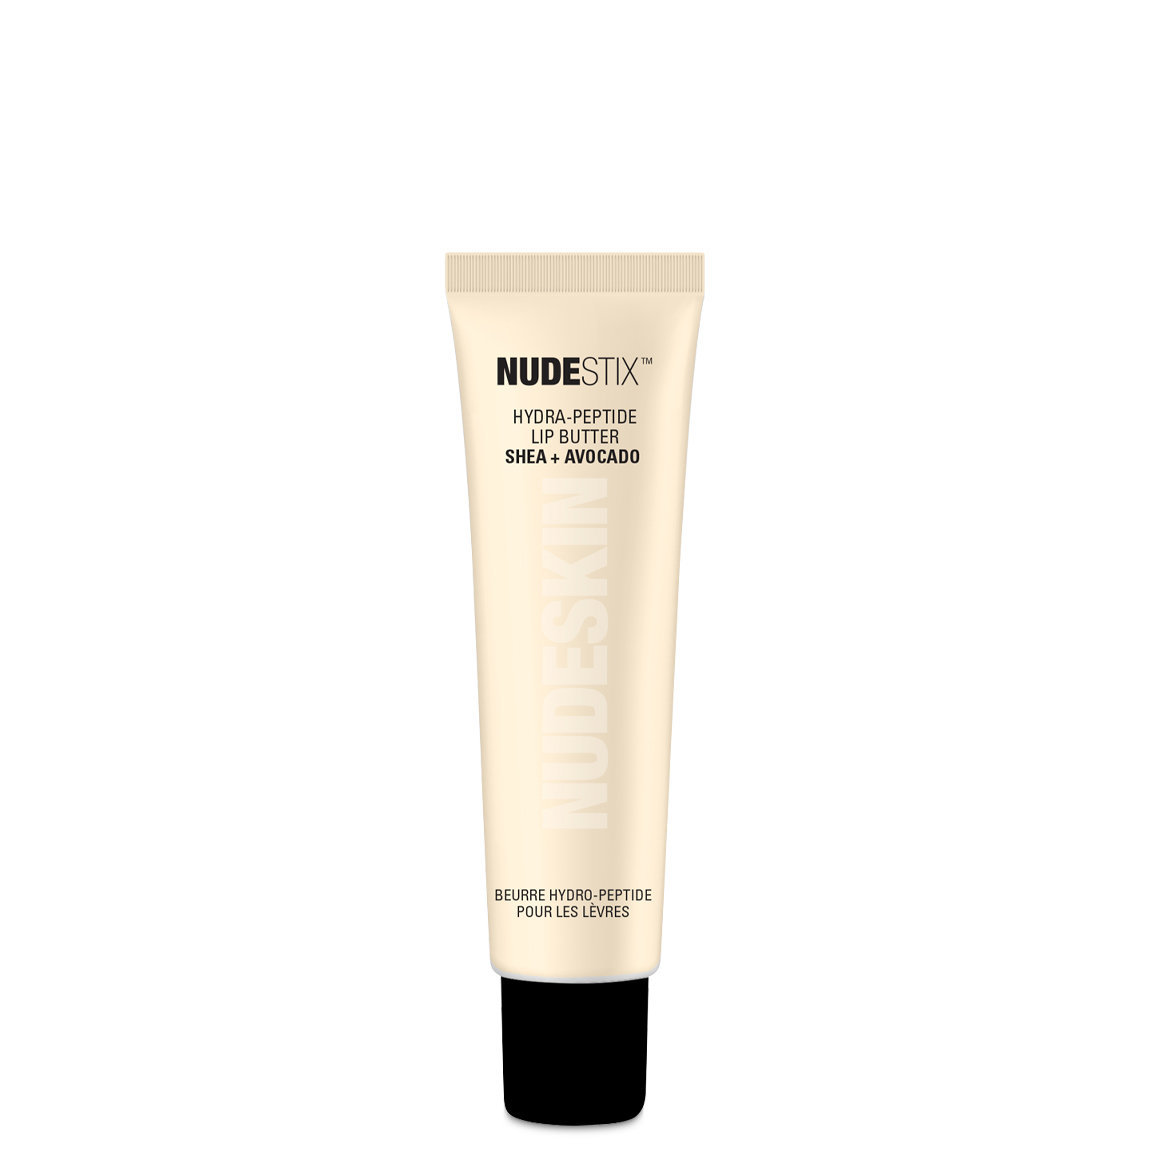 Nudestix Hydra-Peptide Lip Butter alternative view 1 - product swatch.